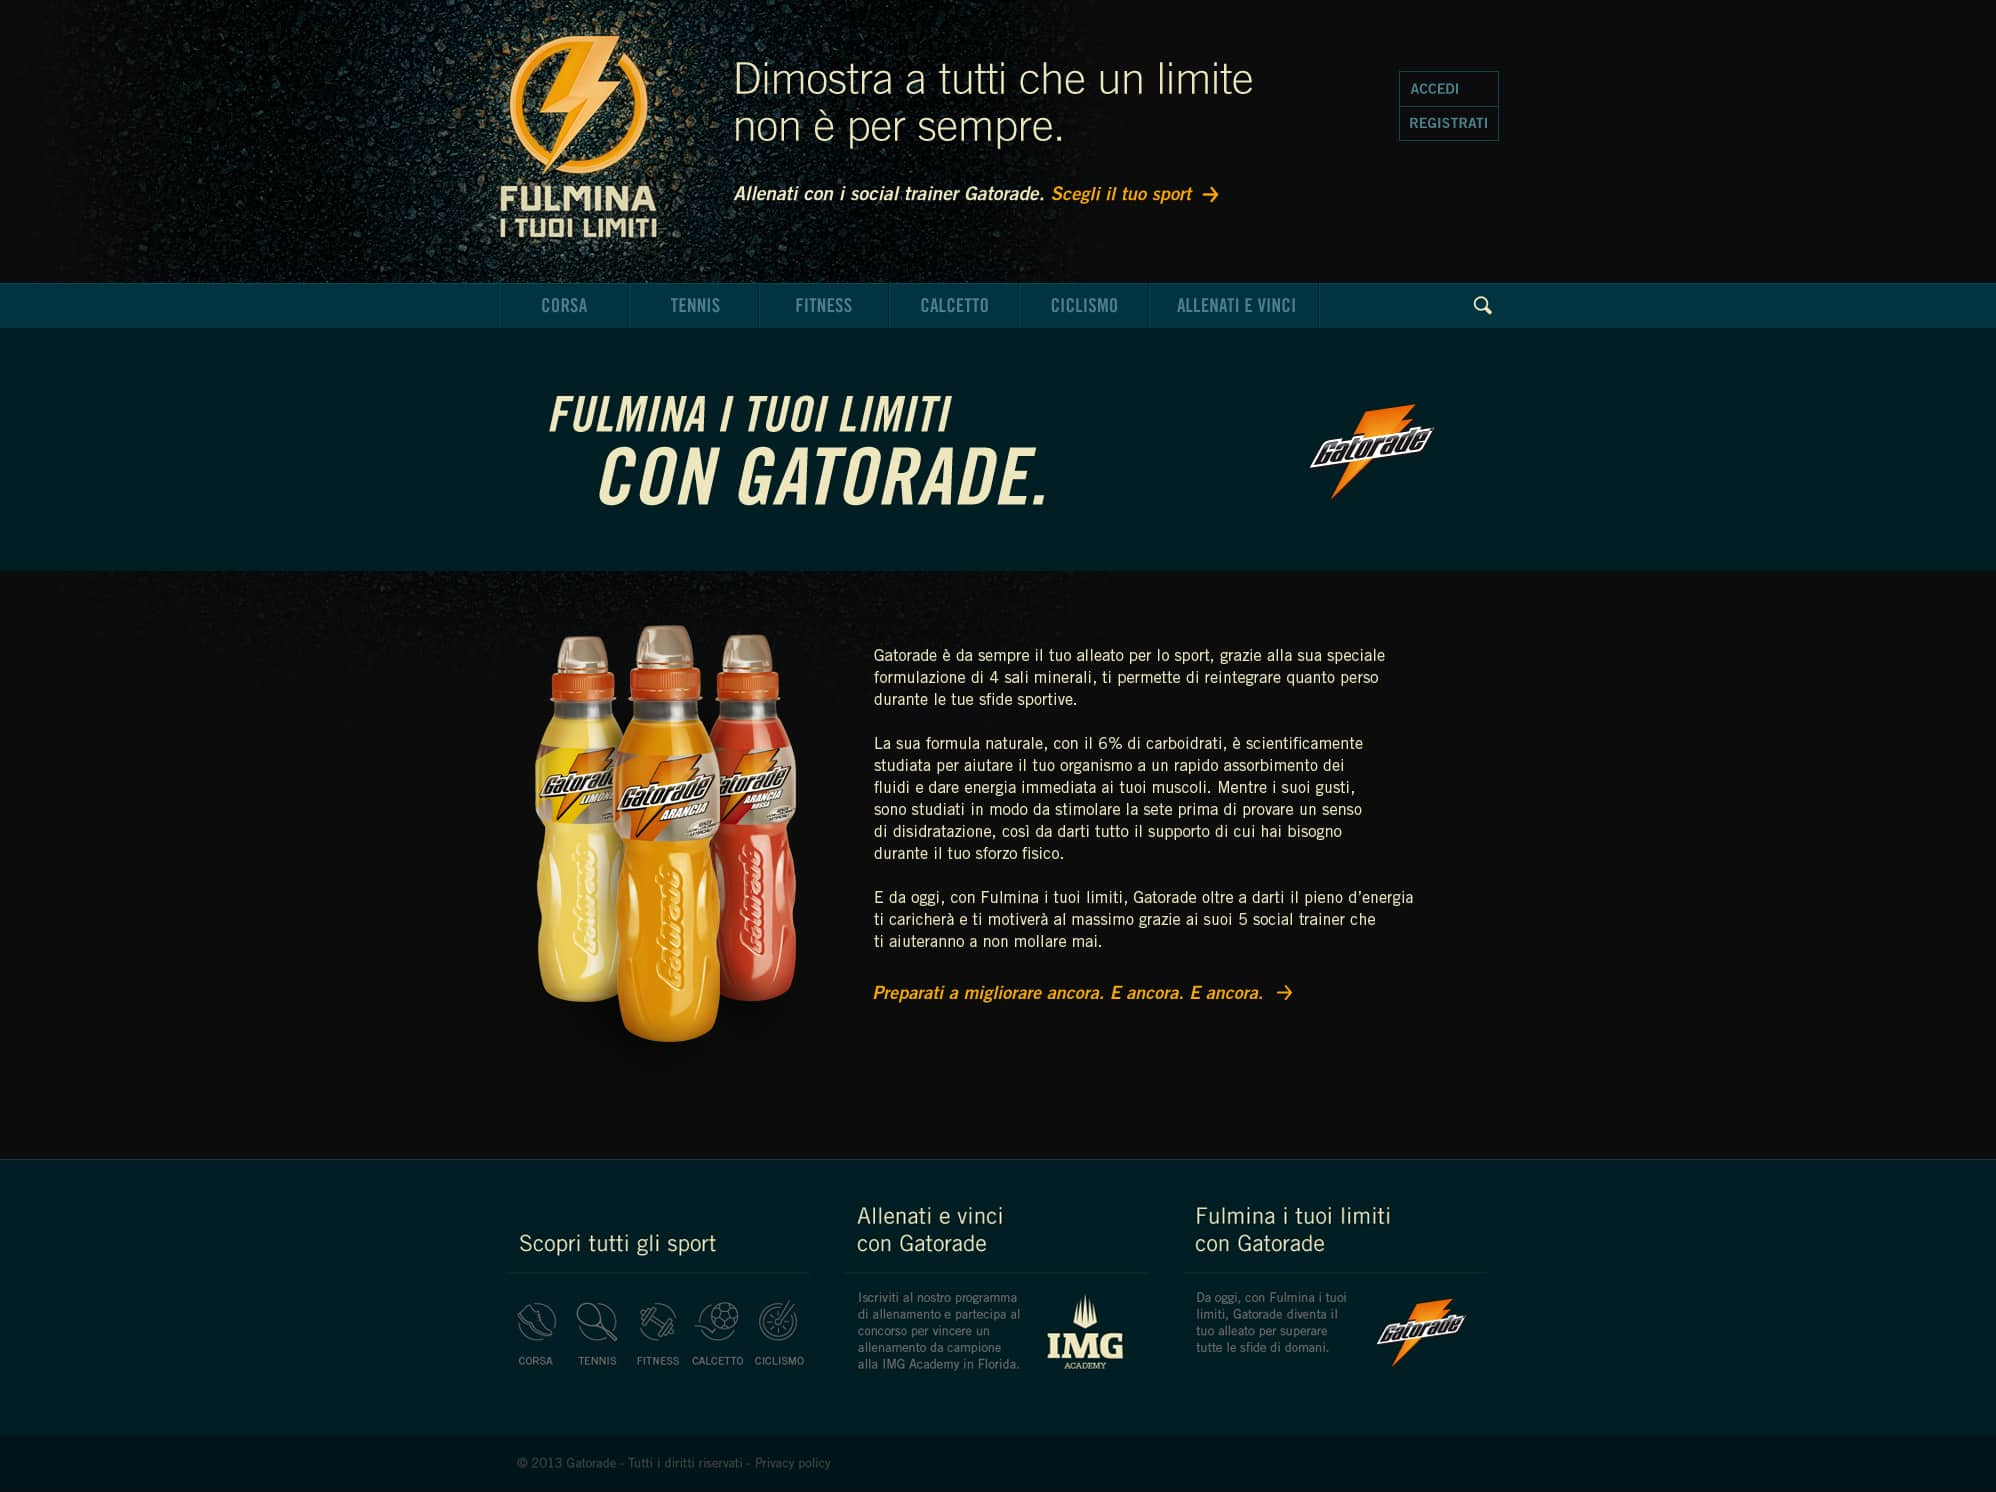 Gatorade | Fulmina i tuoi limiti